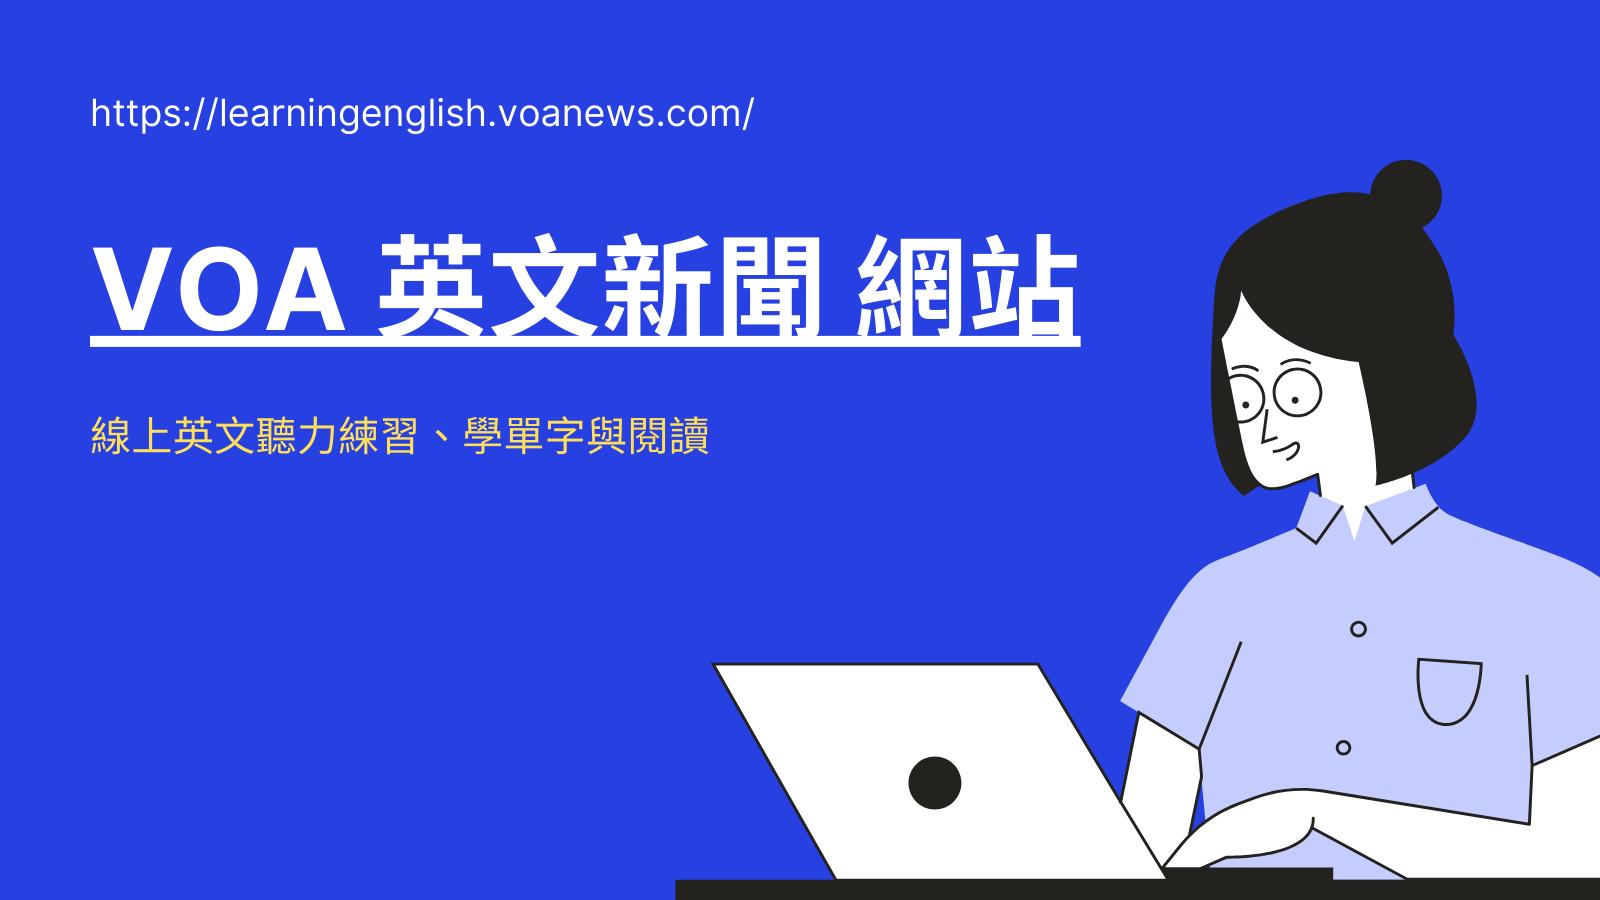 VOA 英文新聞 | 線上英文聽力練習、學習單字與閱讀,可下載MP3